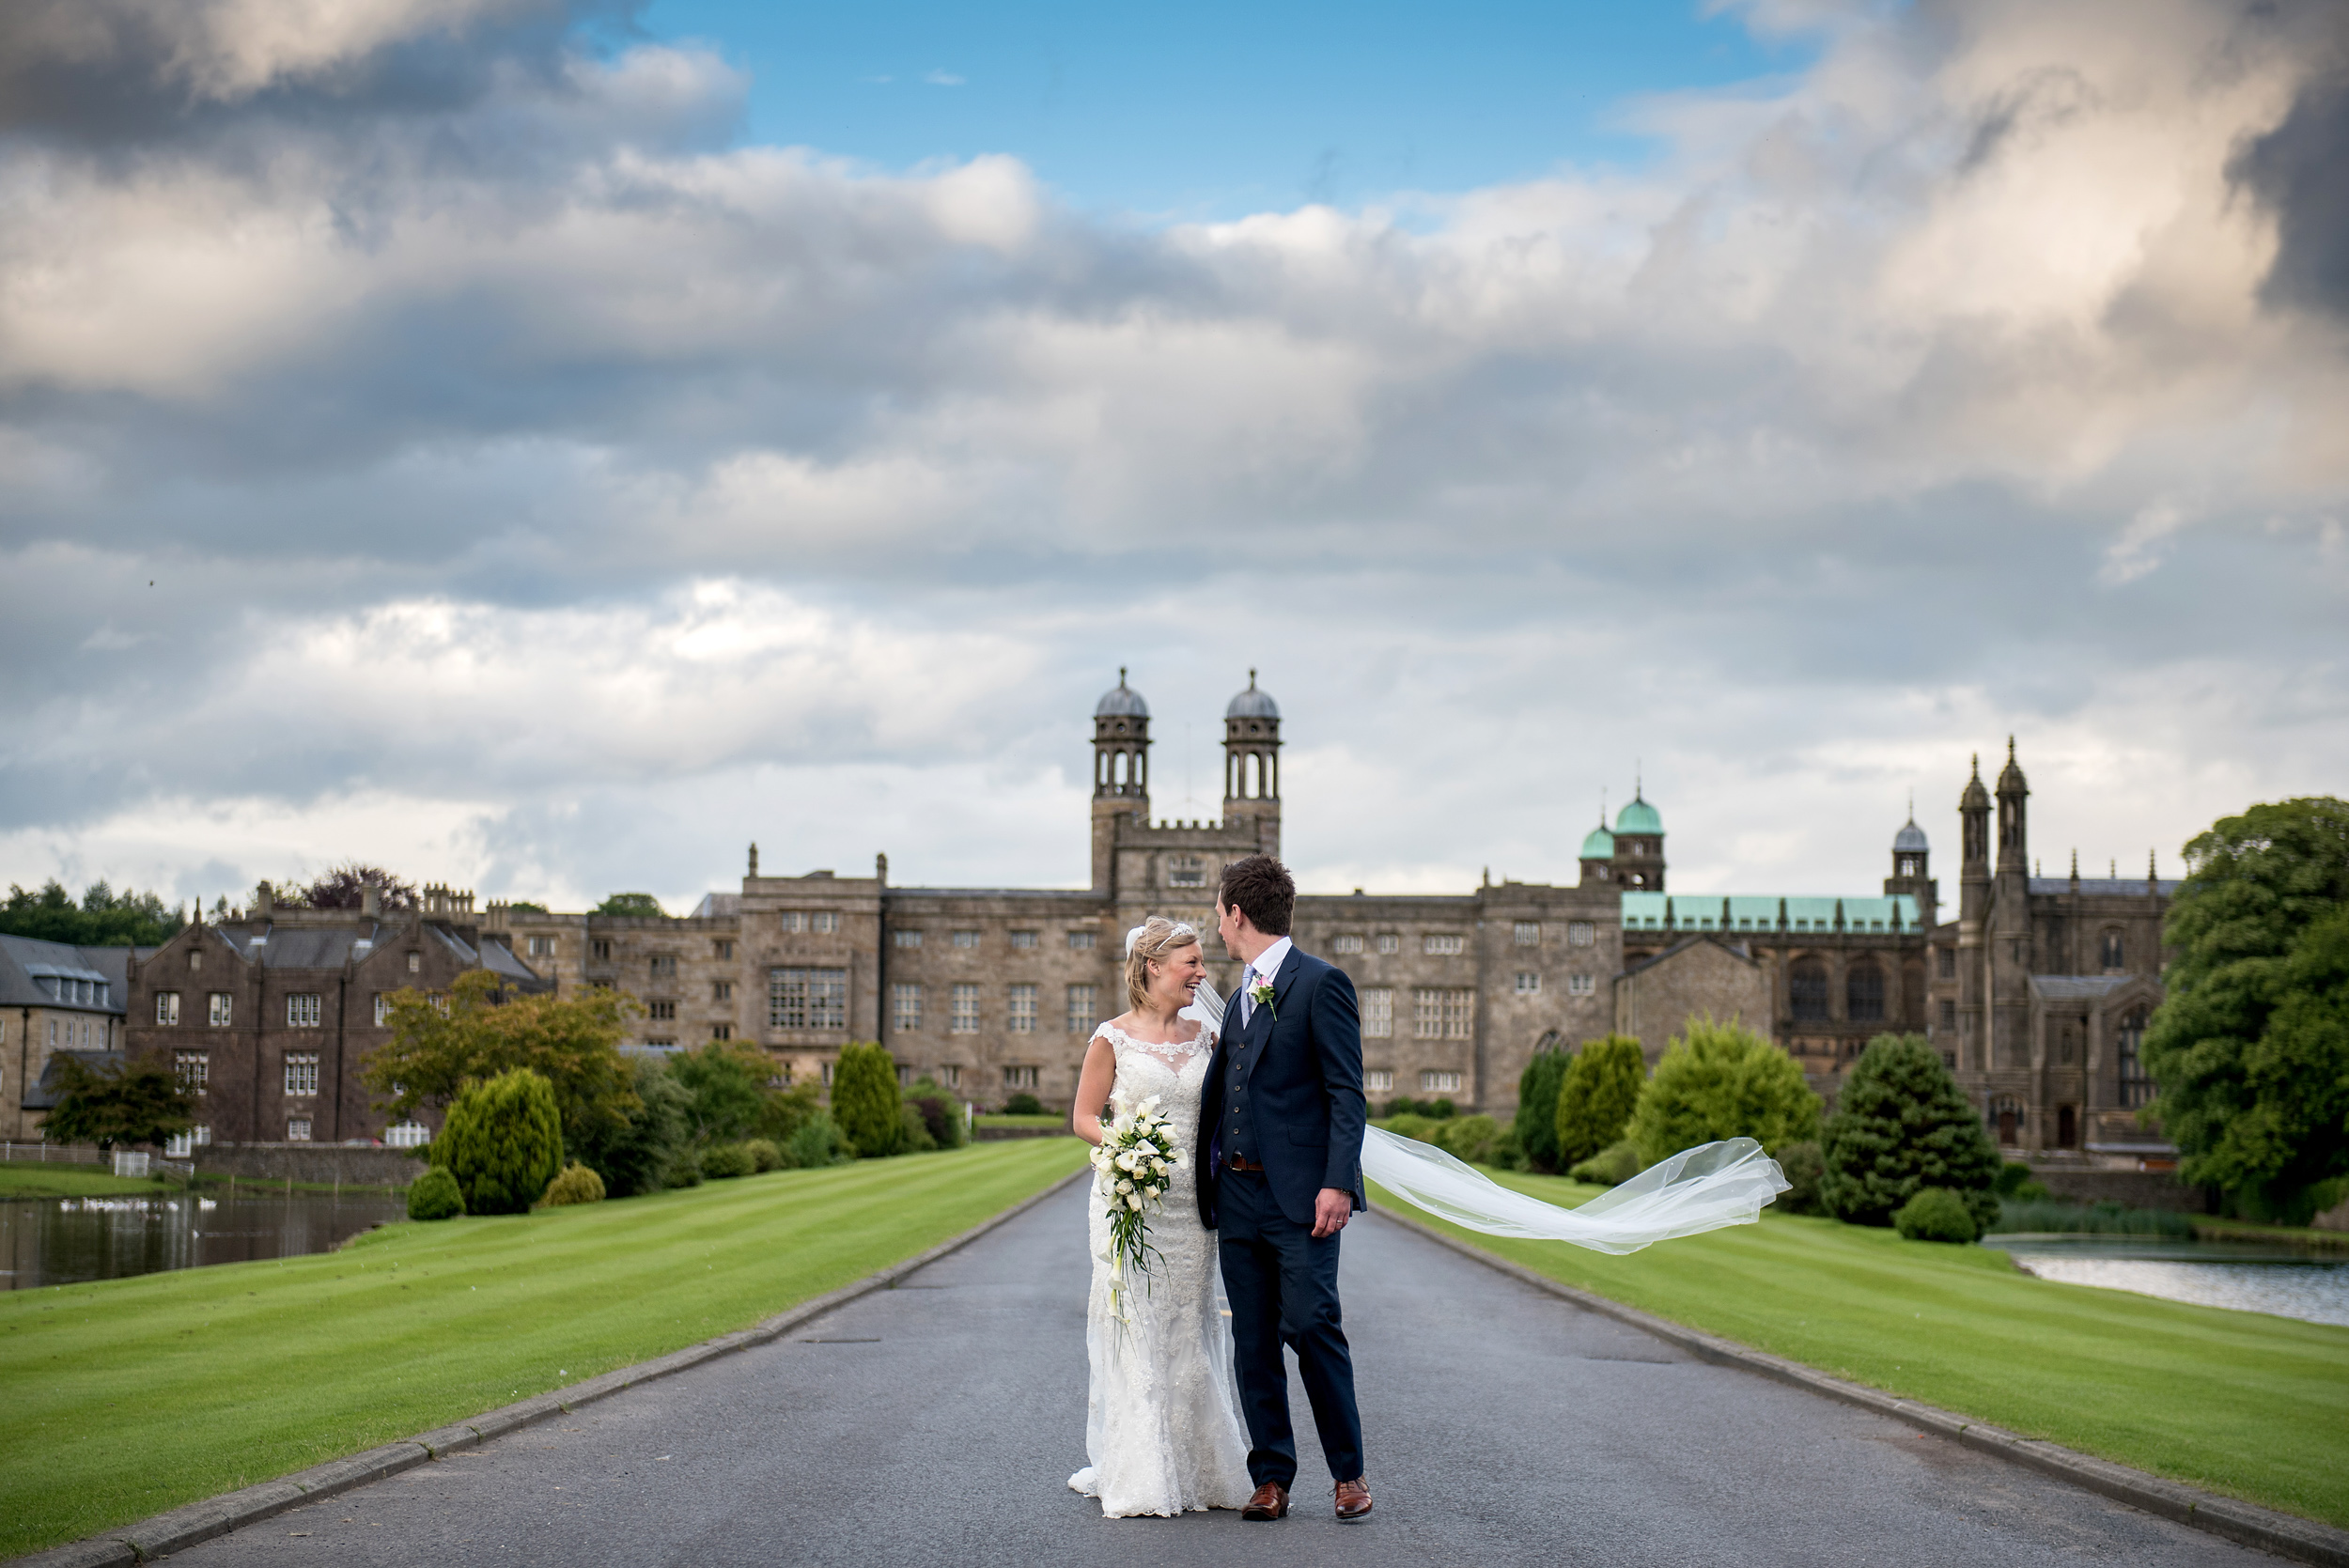 David Scholes Lancashire wedding photography 2016-129.jpg